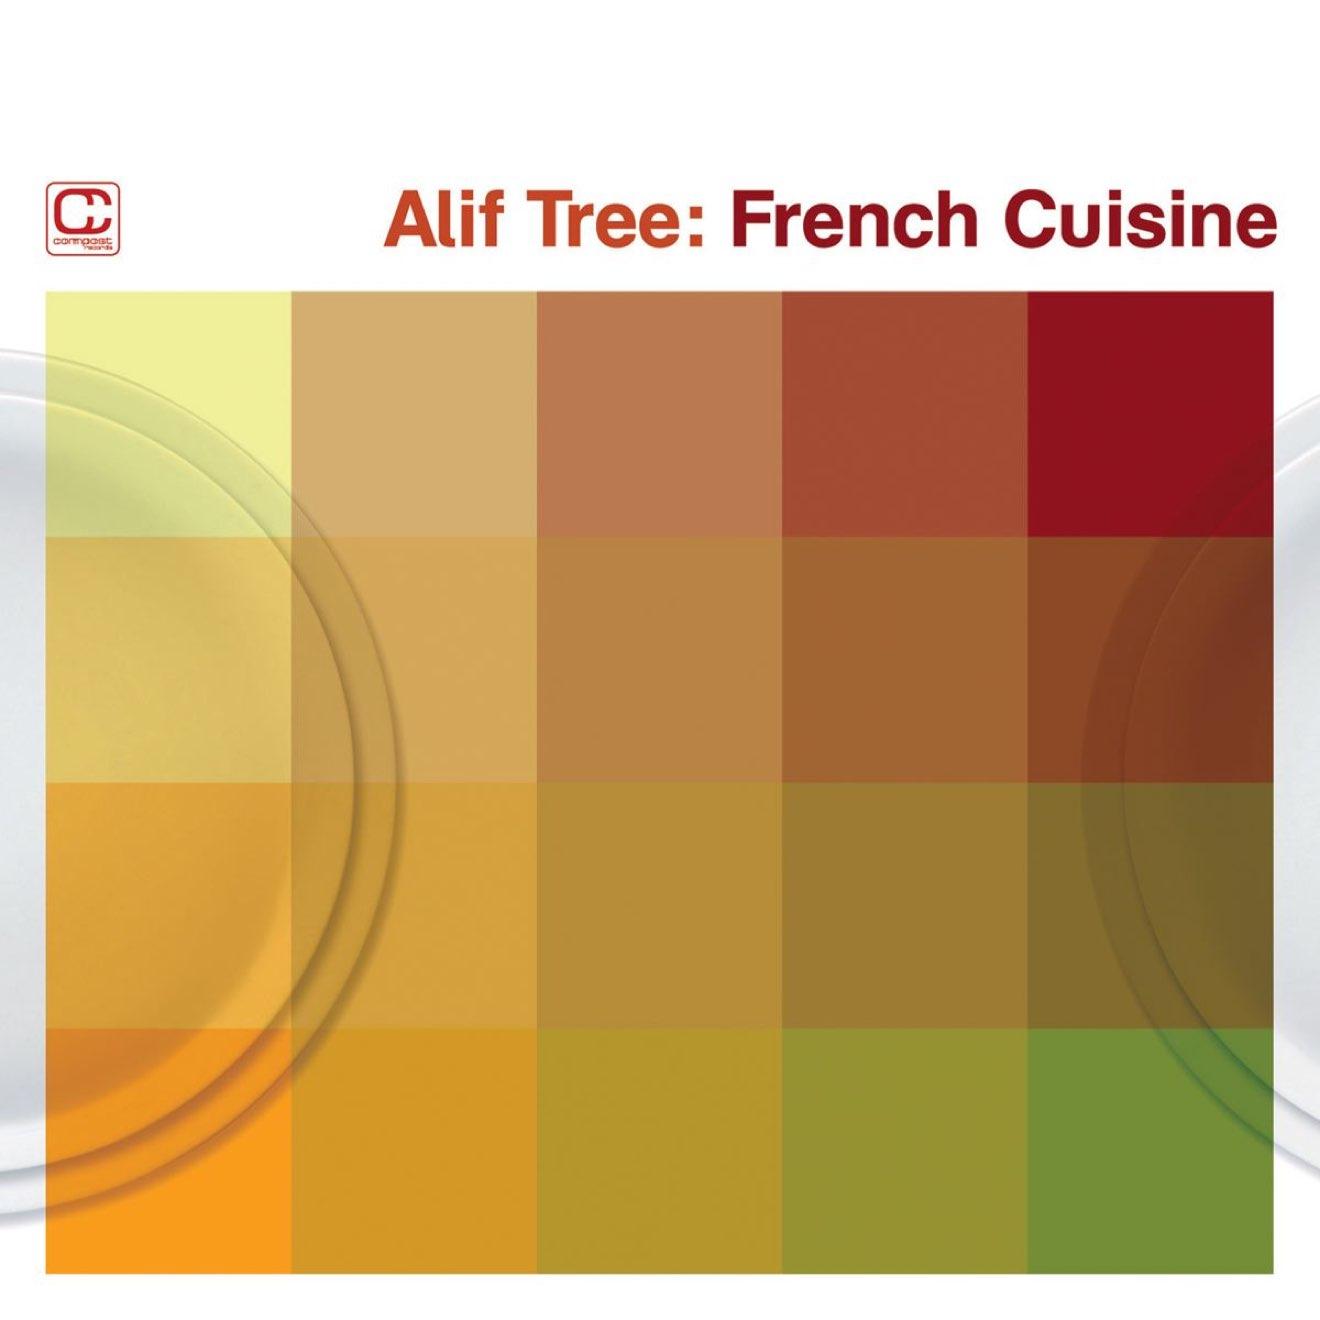 Alif Tree